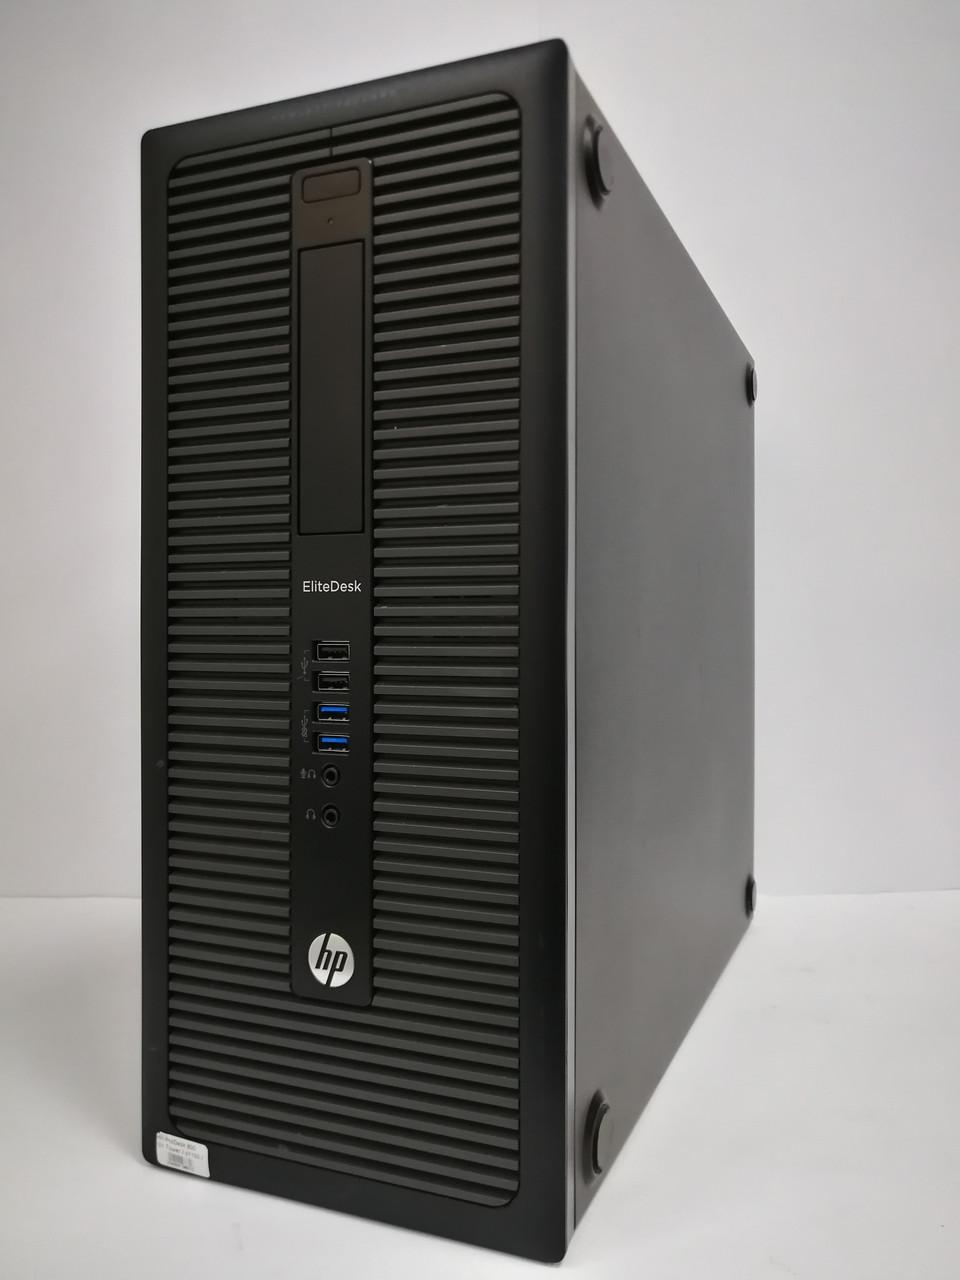 Компьютер HP 800 G1, Intel Core i3-4130 3.4GHz, RAM 4ГБ, SSD 120ГБ